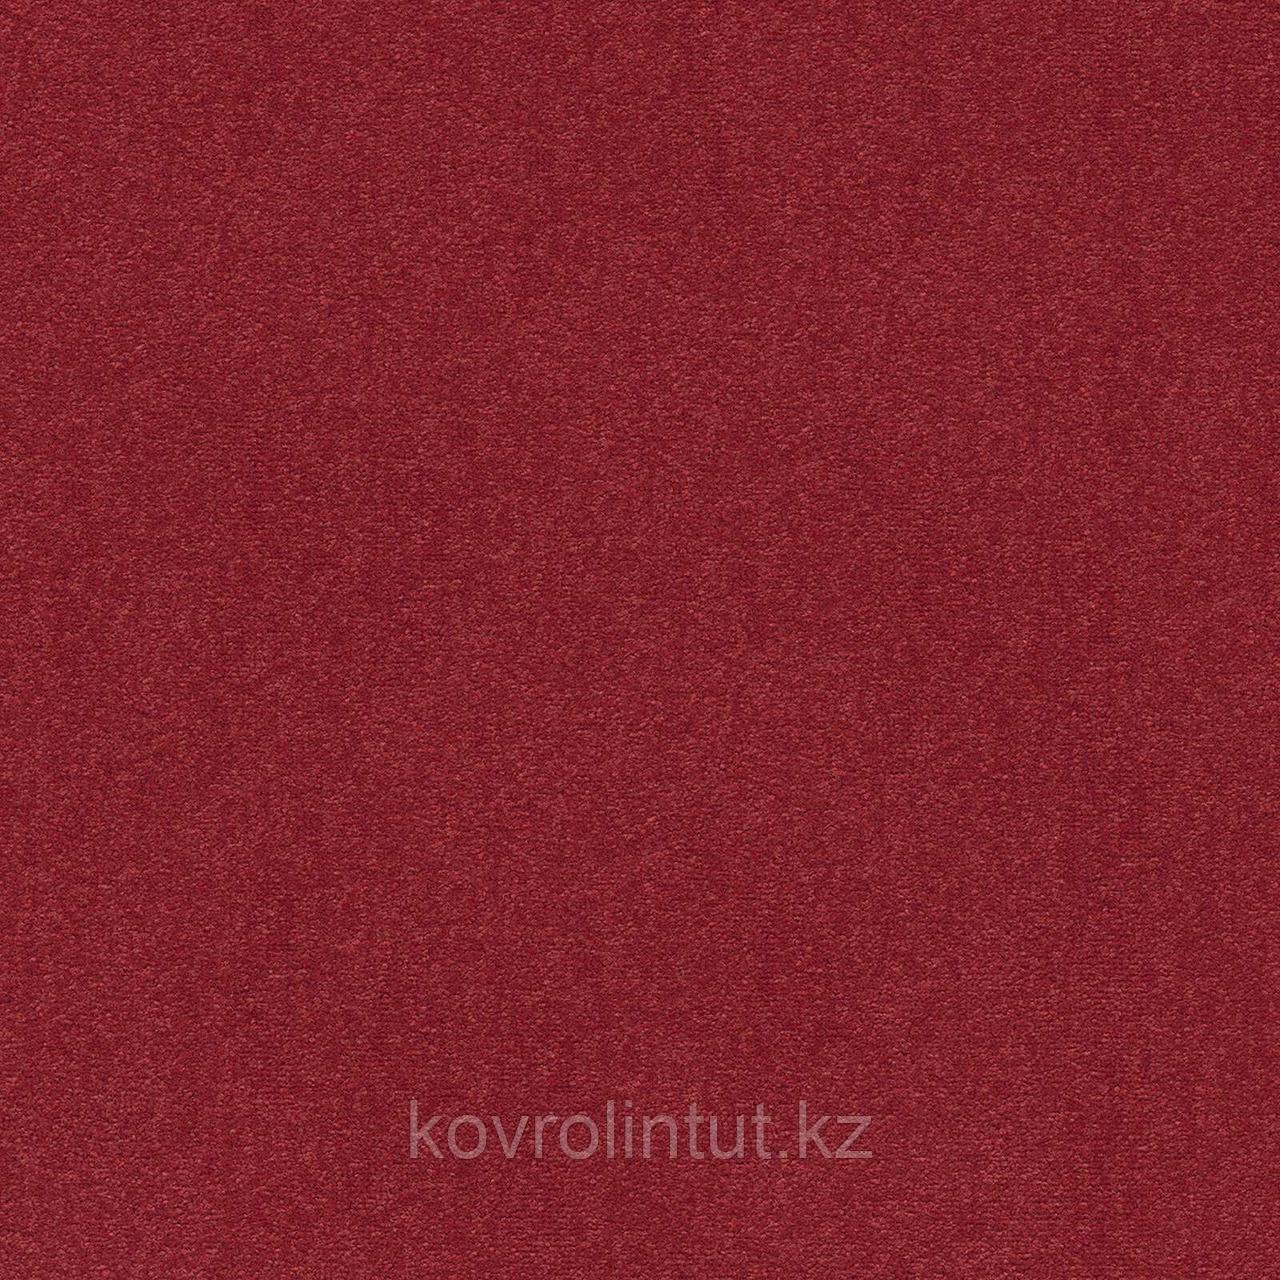 Плитка ковровая Modulyss Cambridge 307, 100% PA